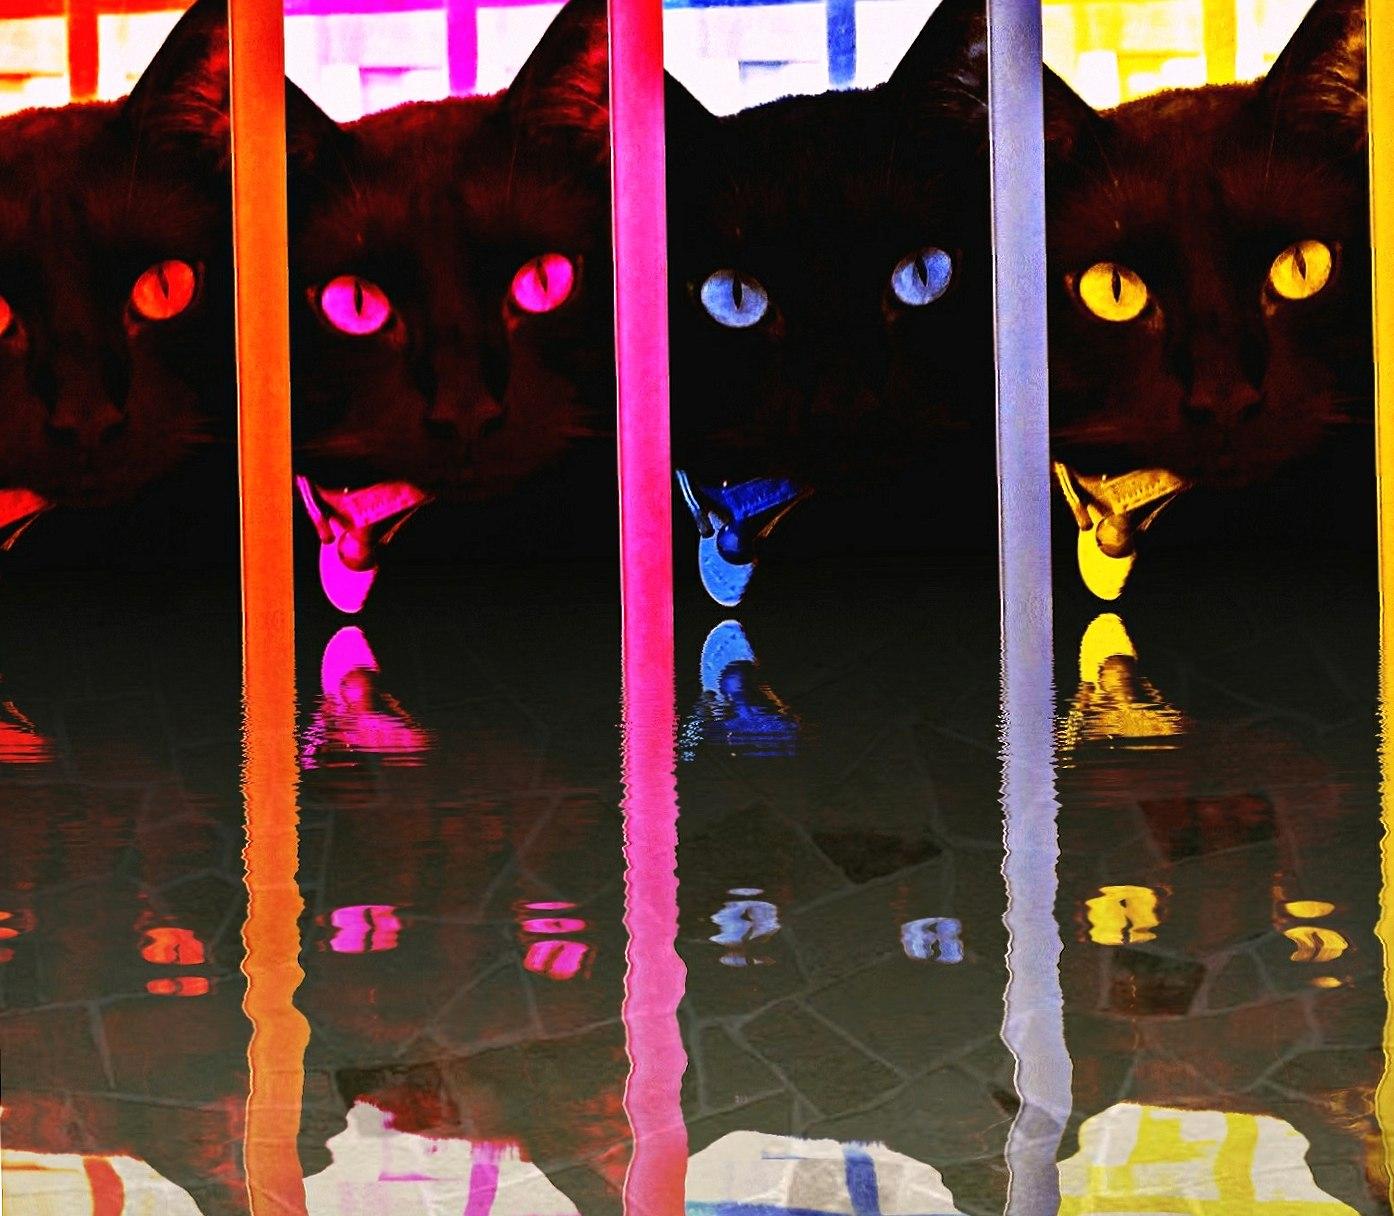 Rainbowblackcat2 wallpapers HD quality